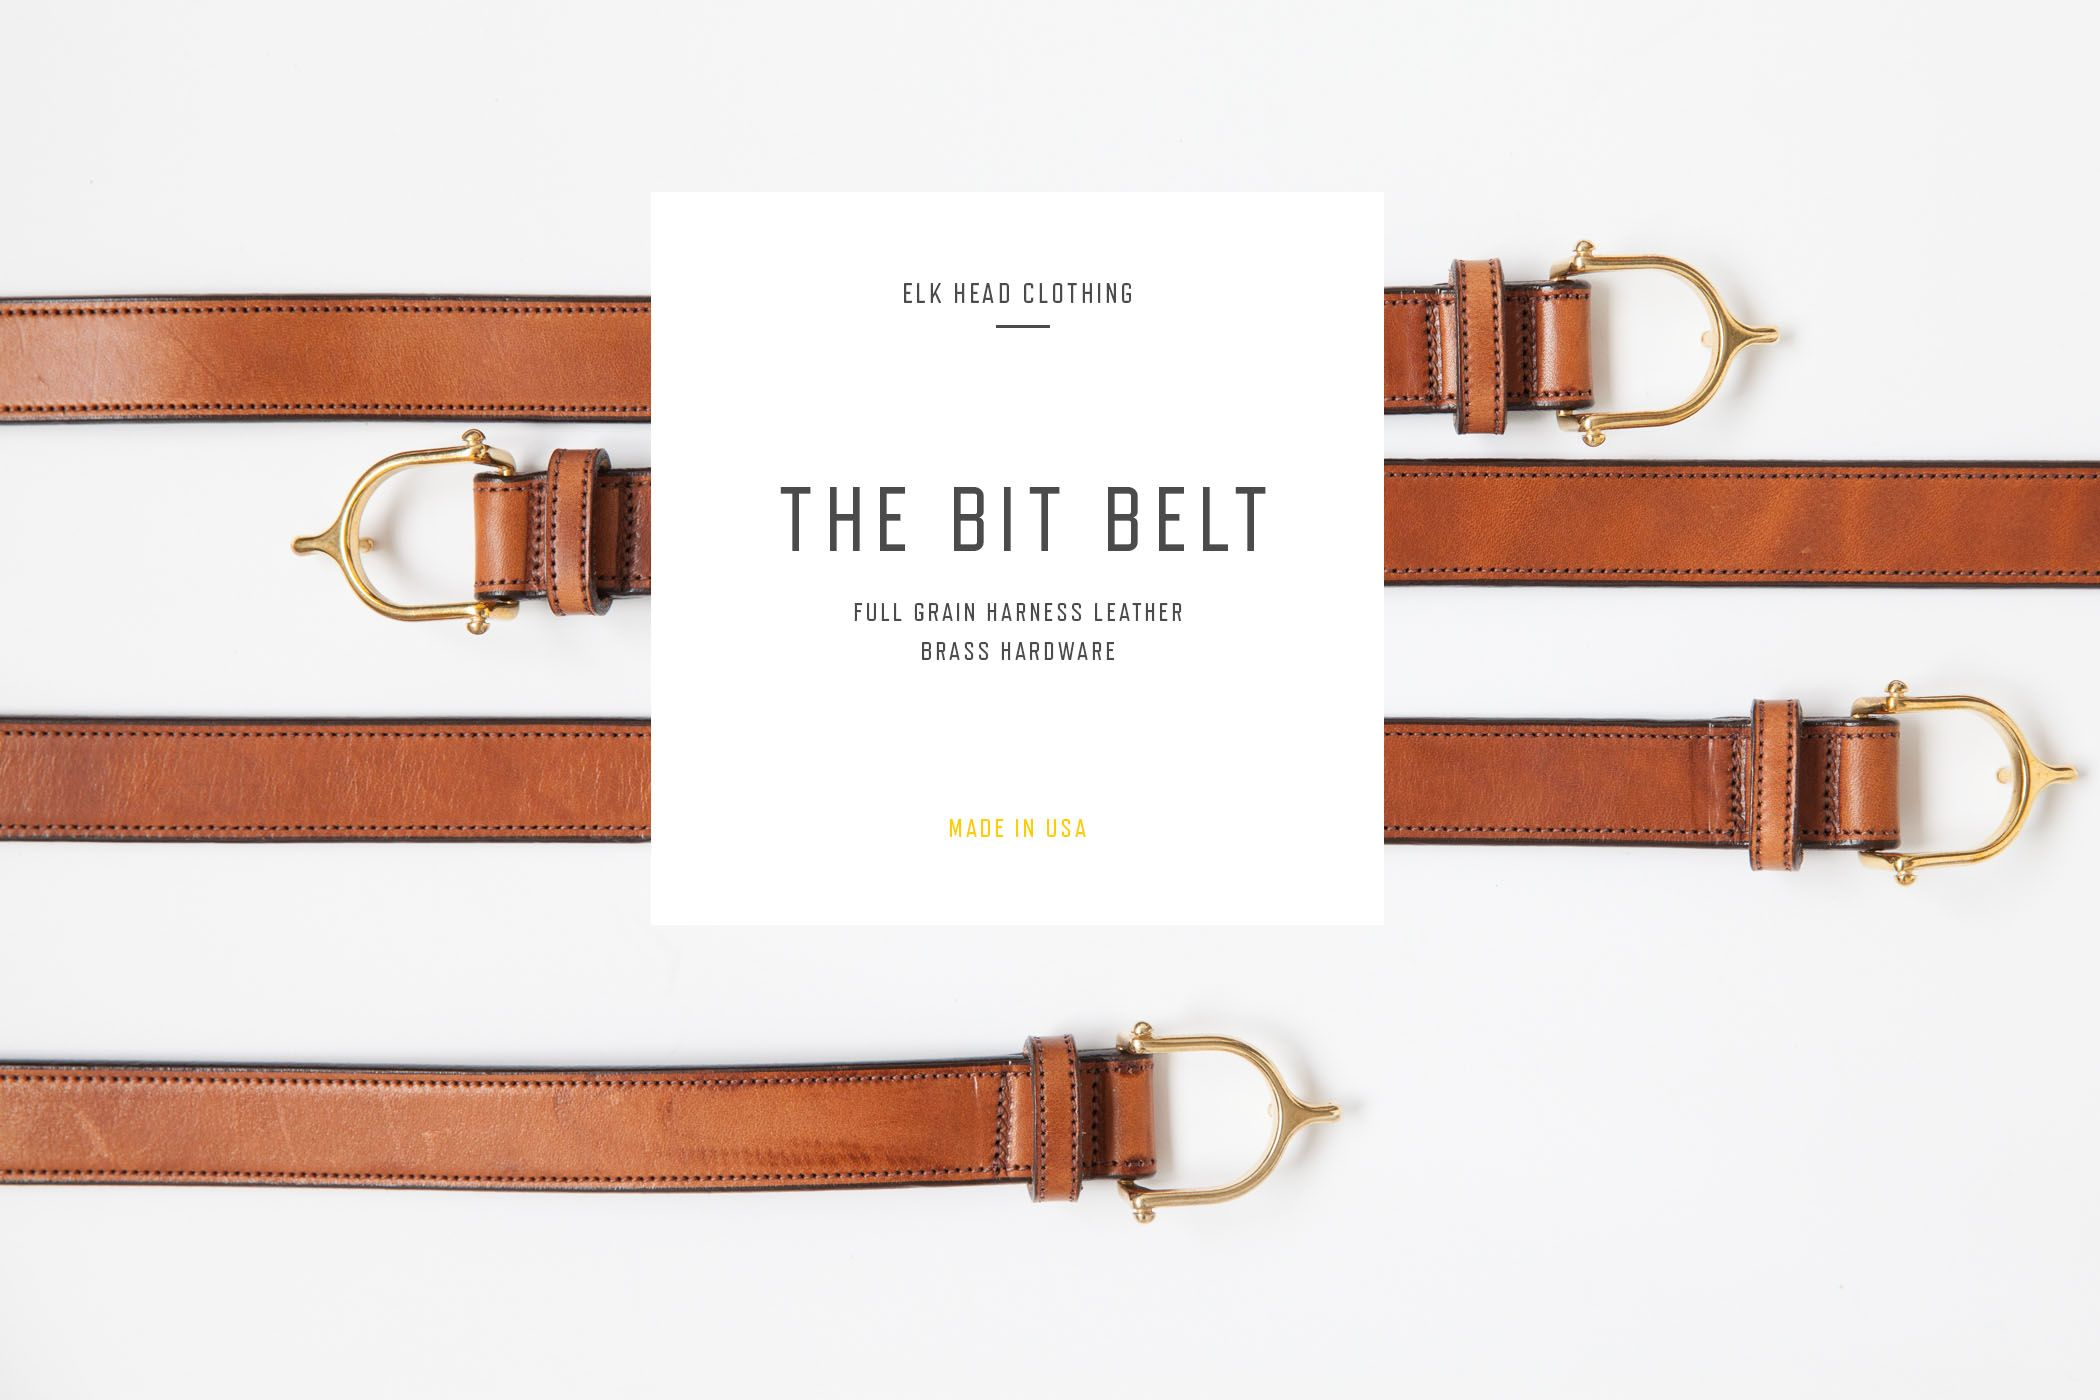 Elk Head Clothing Harness Leather Bit Belt